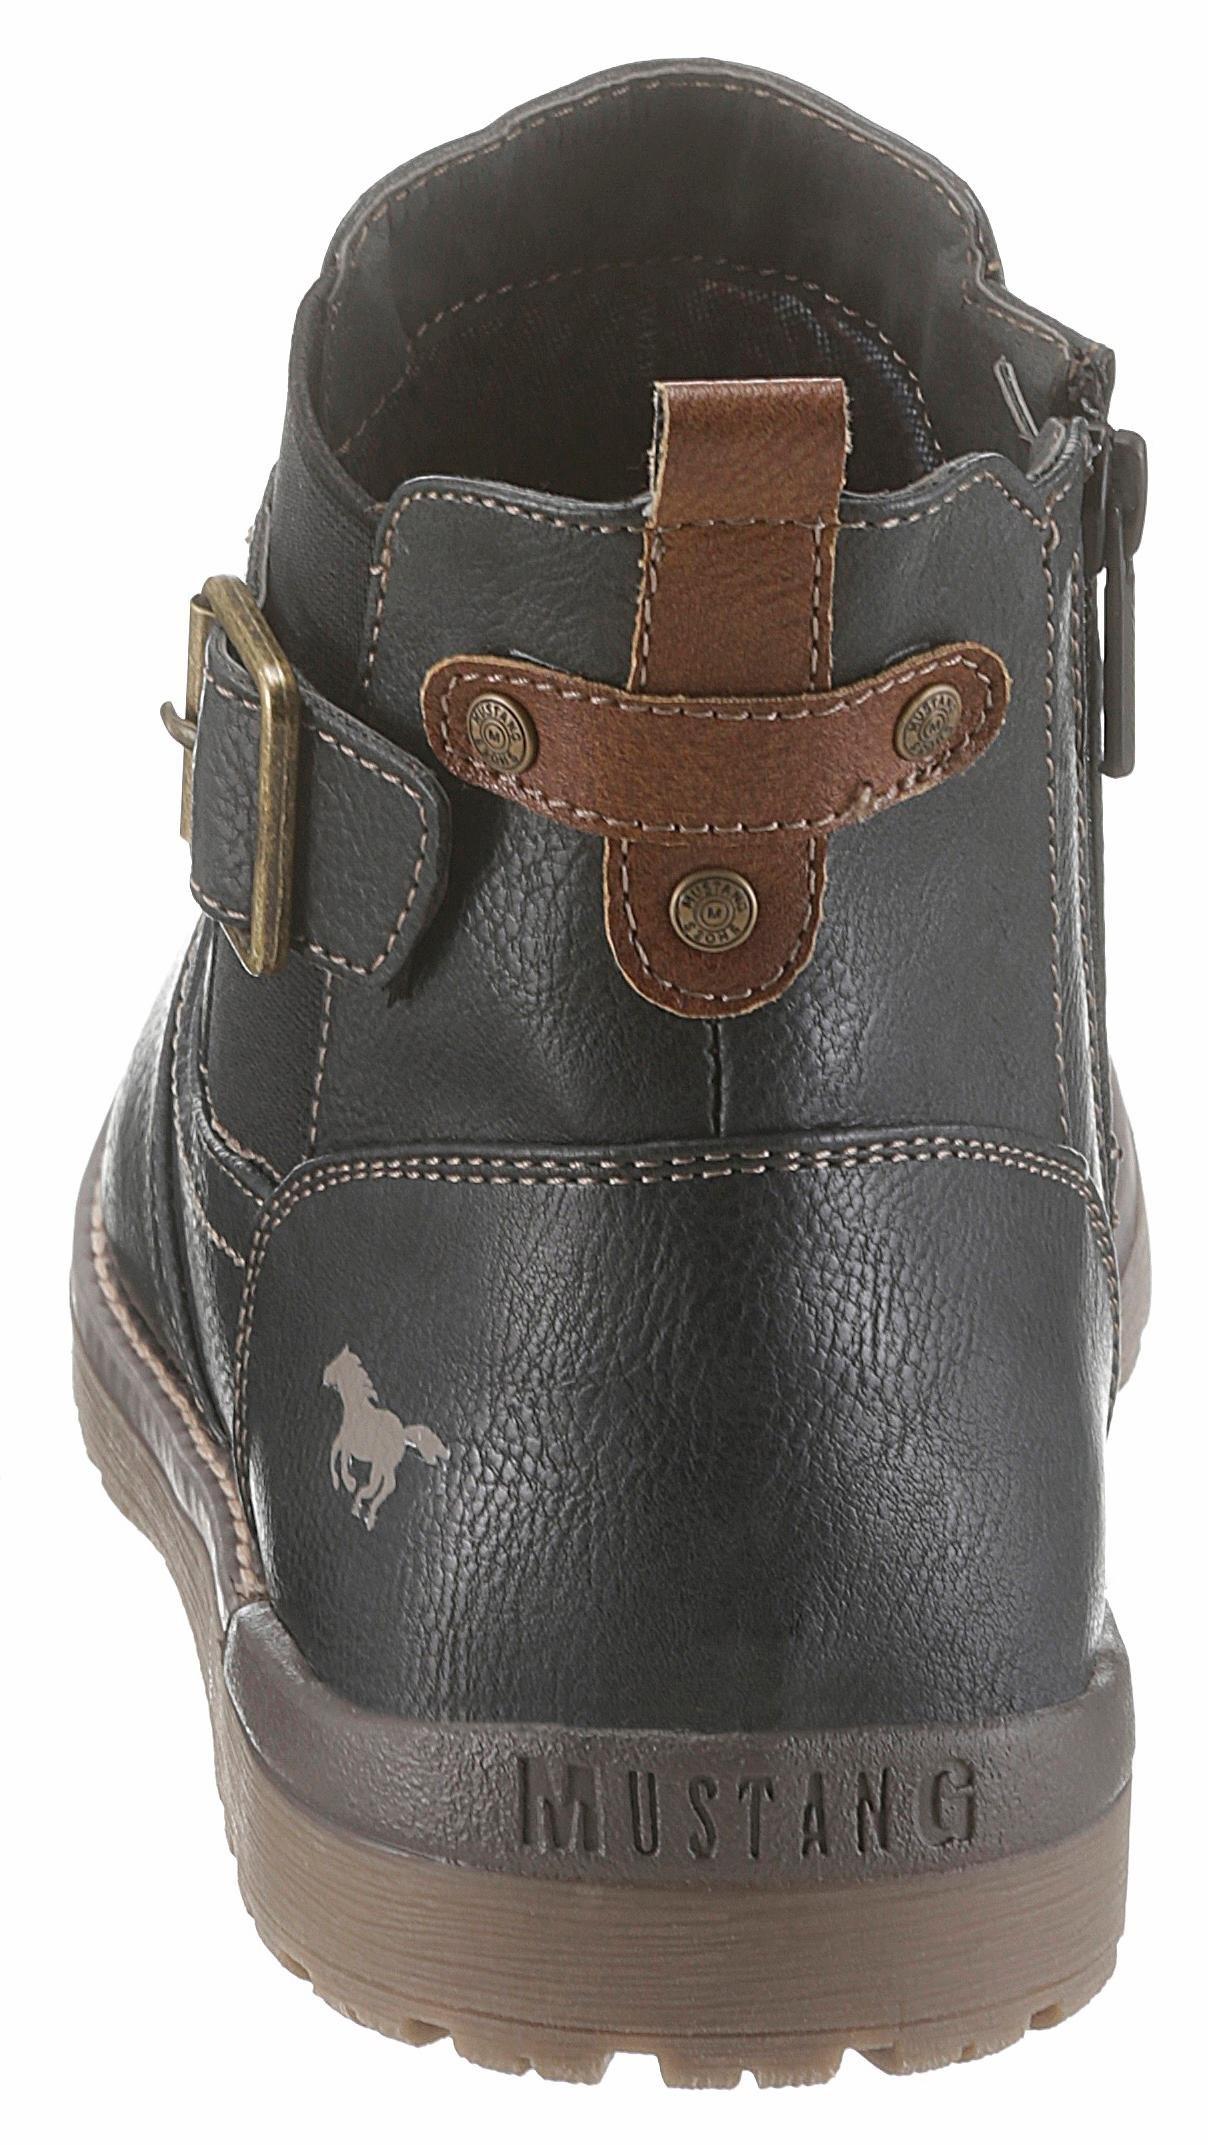 Chelsea Nu Online Kopen Mustang Shoes boots MVpSUzq